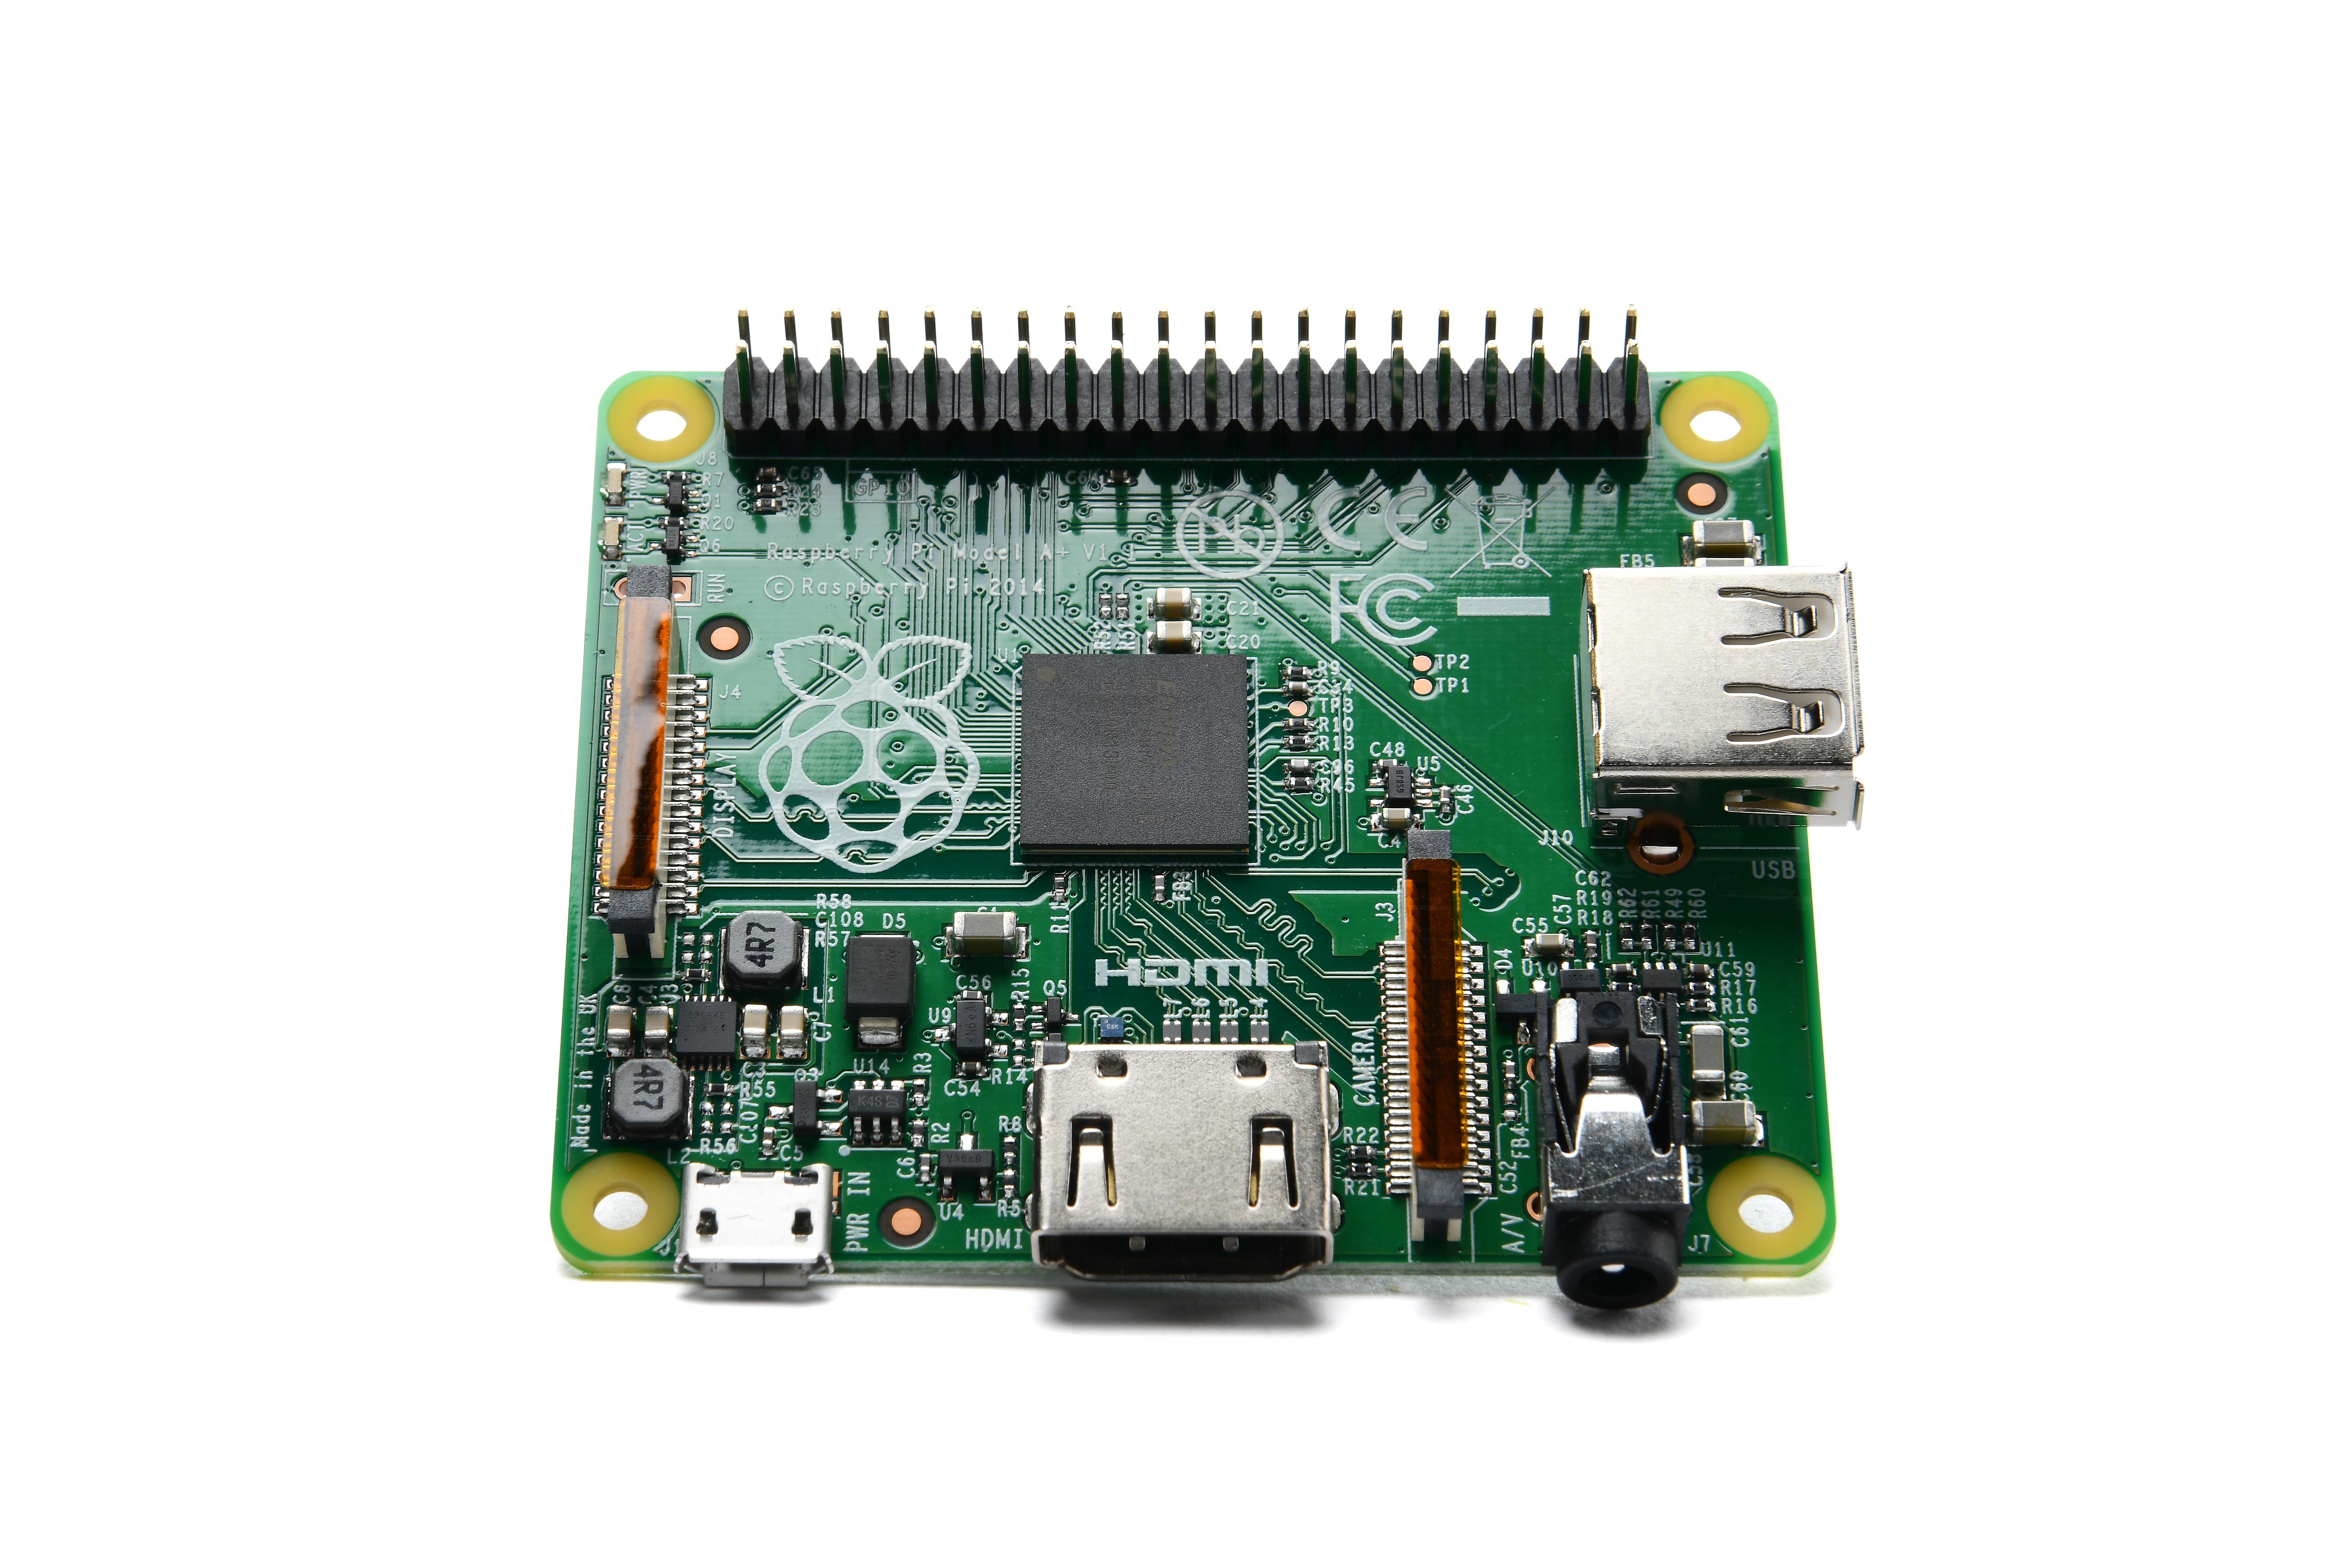 Raspberry Pi 3 Modello A+